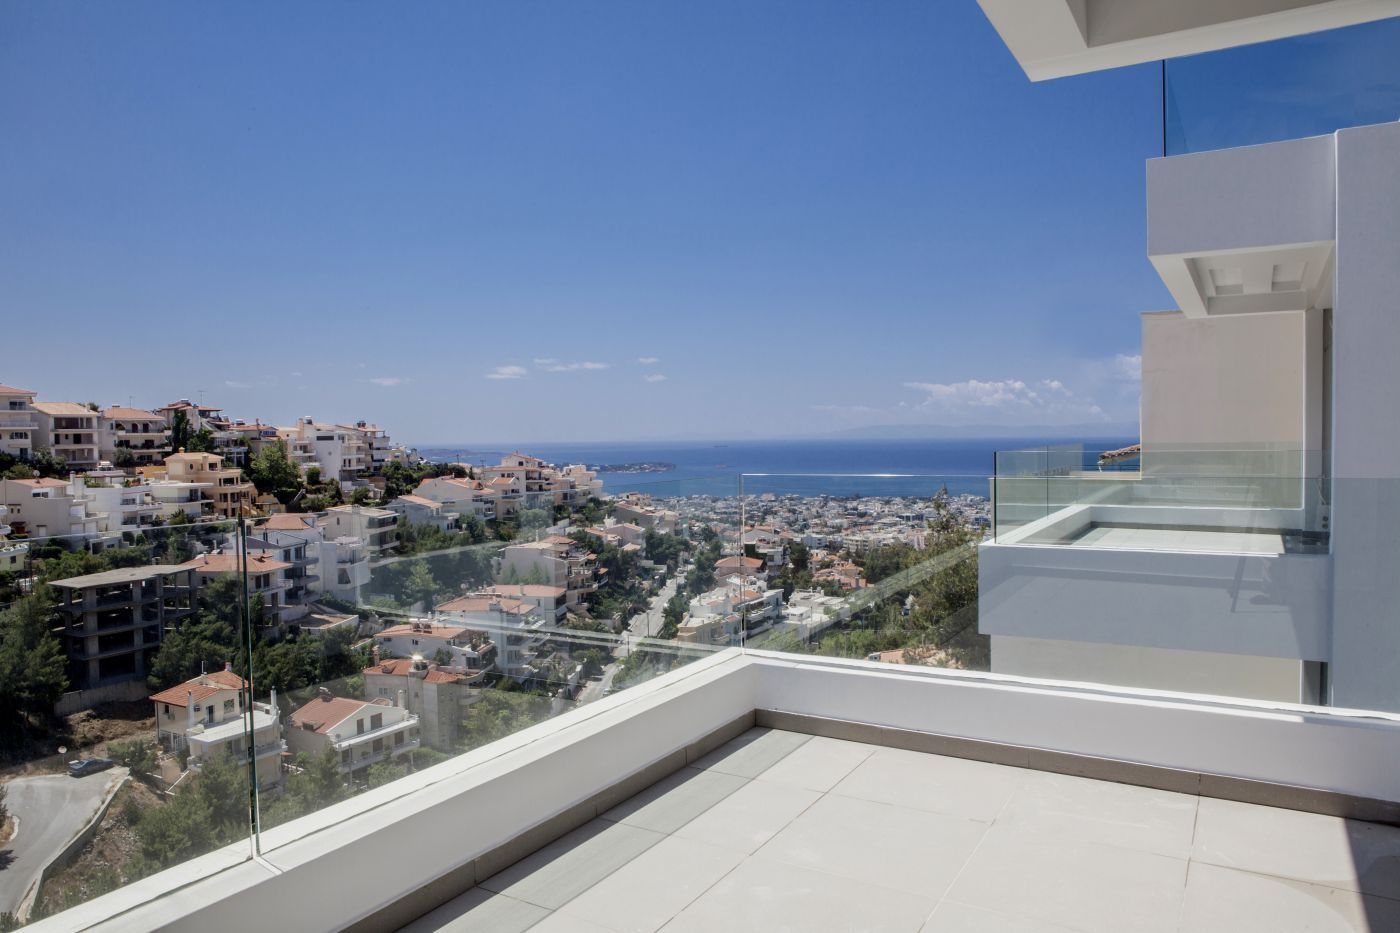 Christakis Oikonomou and Associates, Χρηστάκης Οικονόμου, Θέα θάλασσα, κατoικίες Πανόραμα Βούλας, Κατασκευαστική Γλυφάδα Θεσσαλονίκη